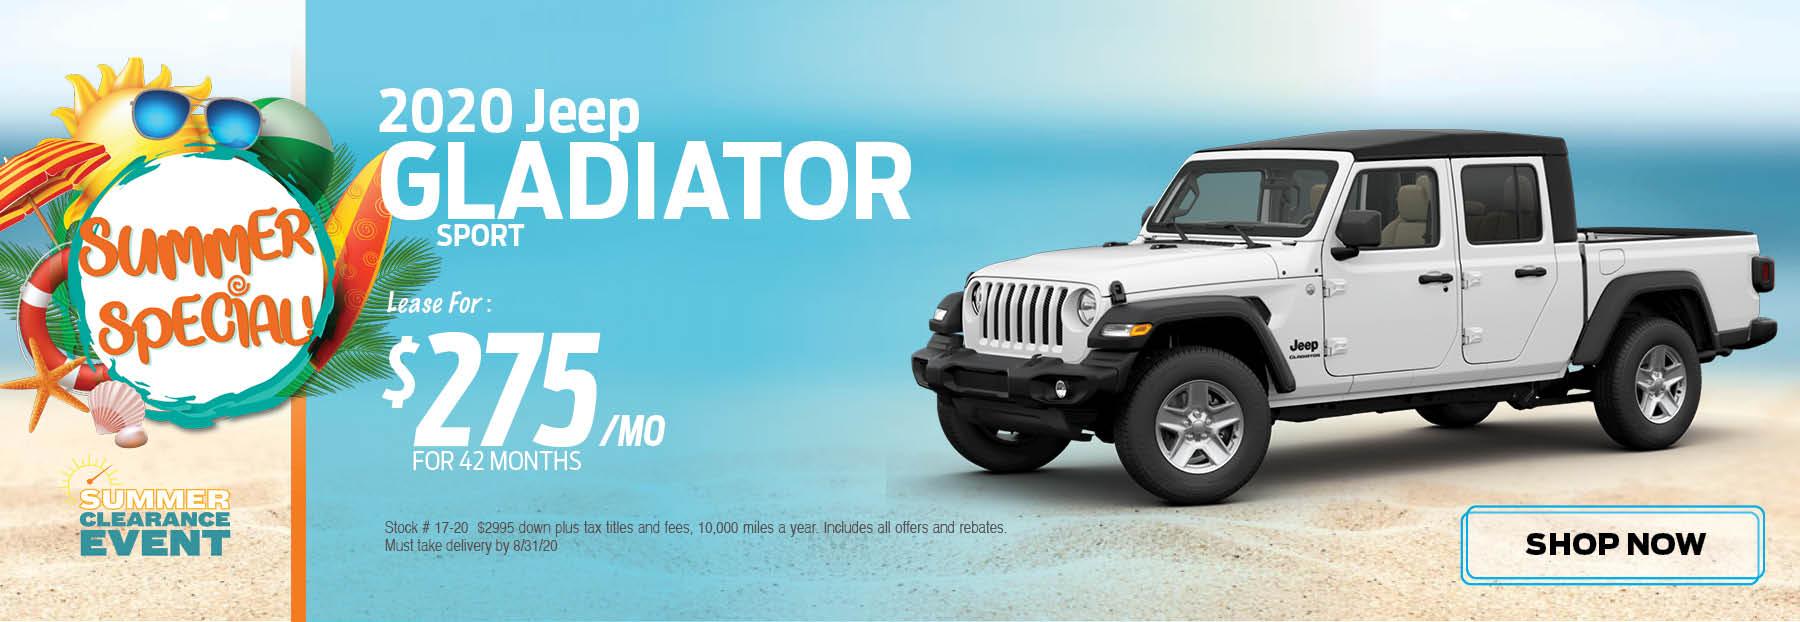 2020 Jeep Cherokee Special